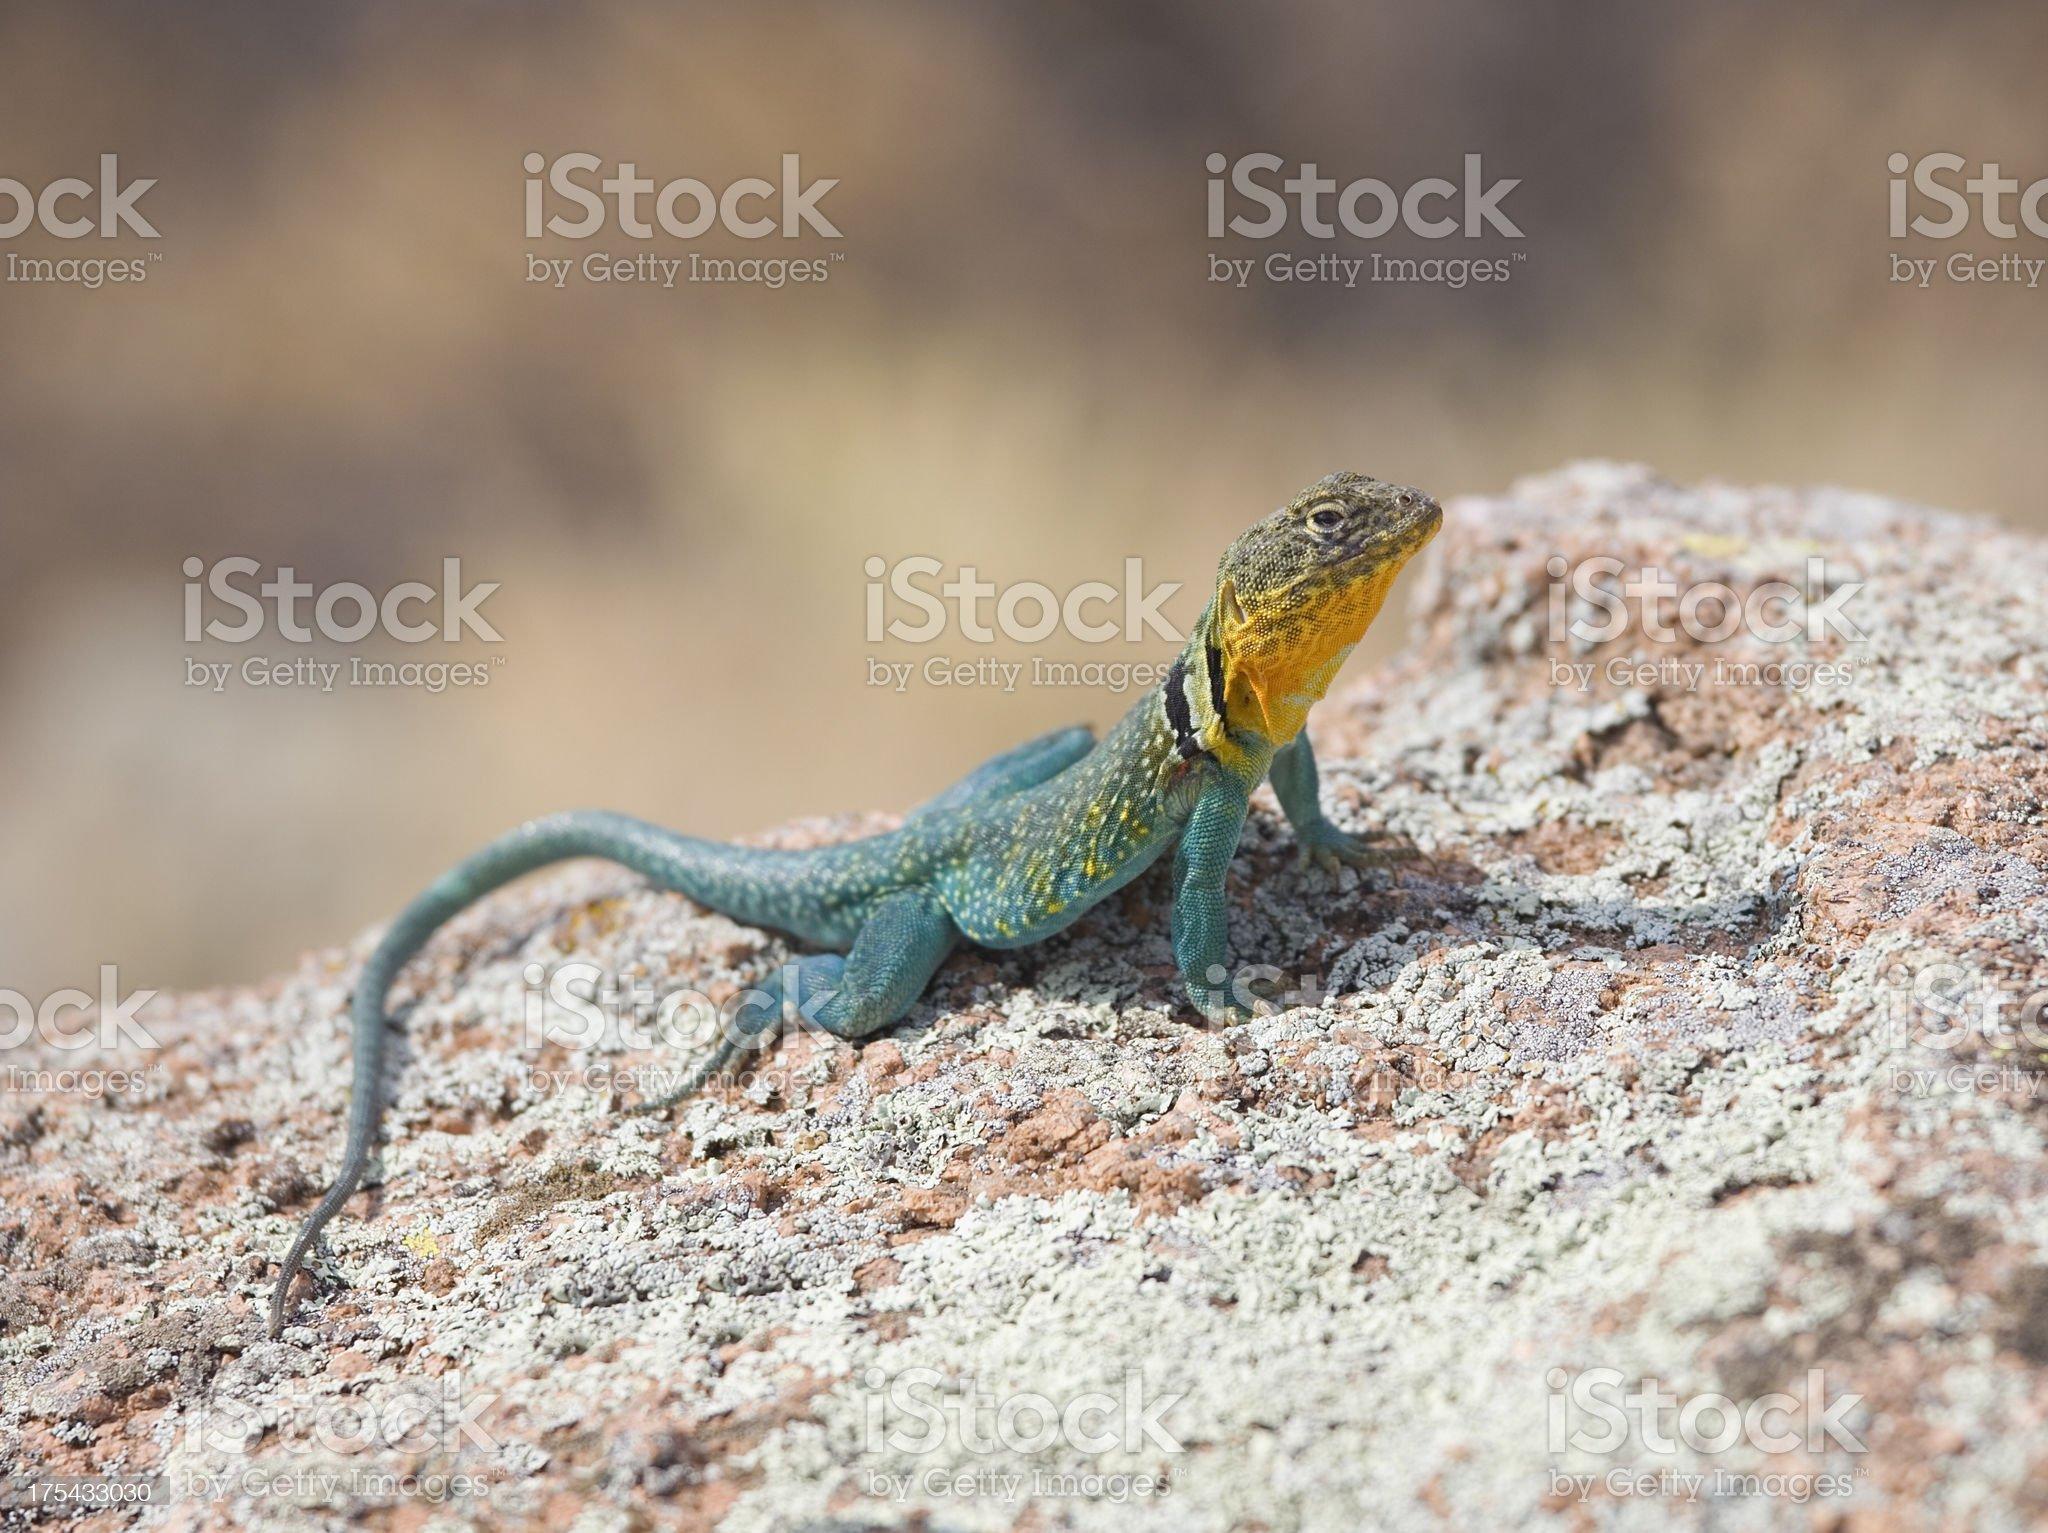 Colorful Eastern collared lizard, Crotaphytus Collaris (Iguana Family) royalty-free stock photo